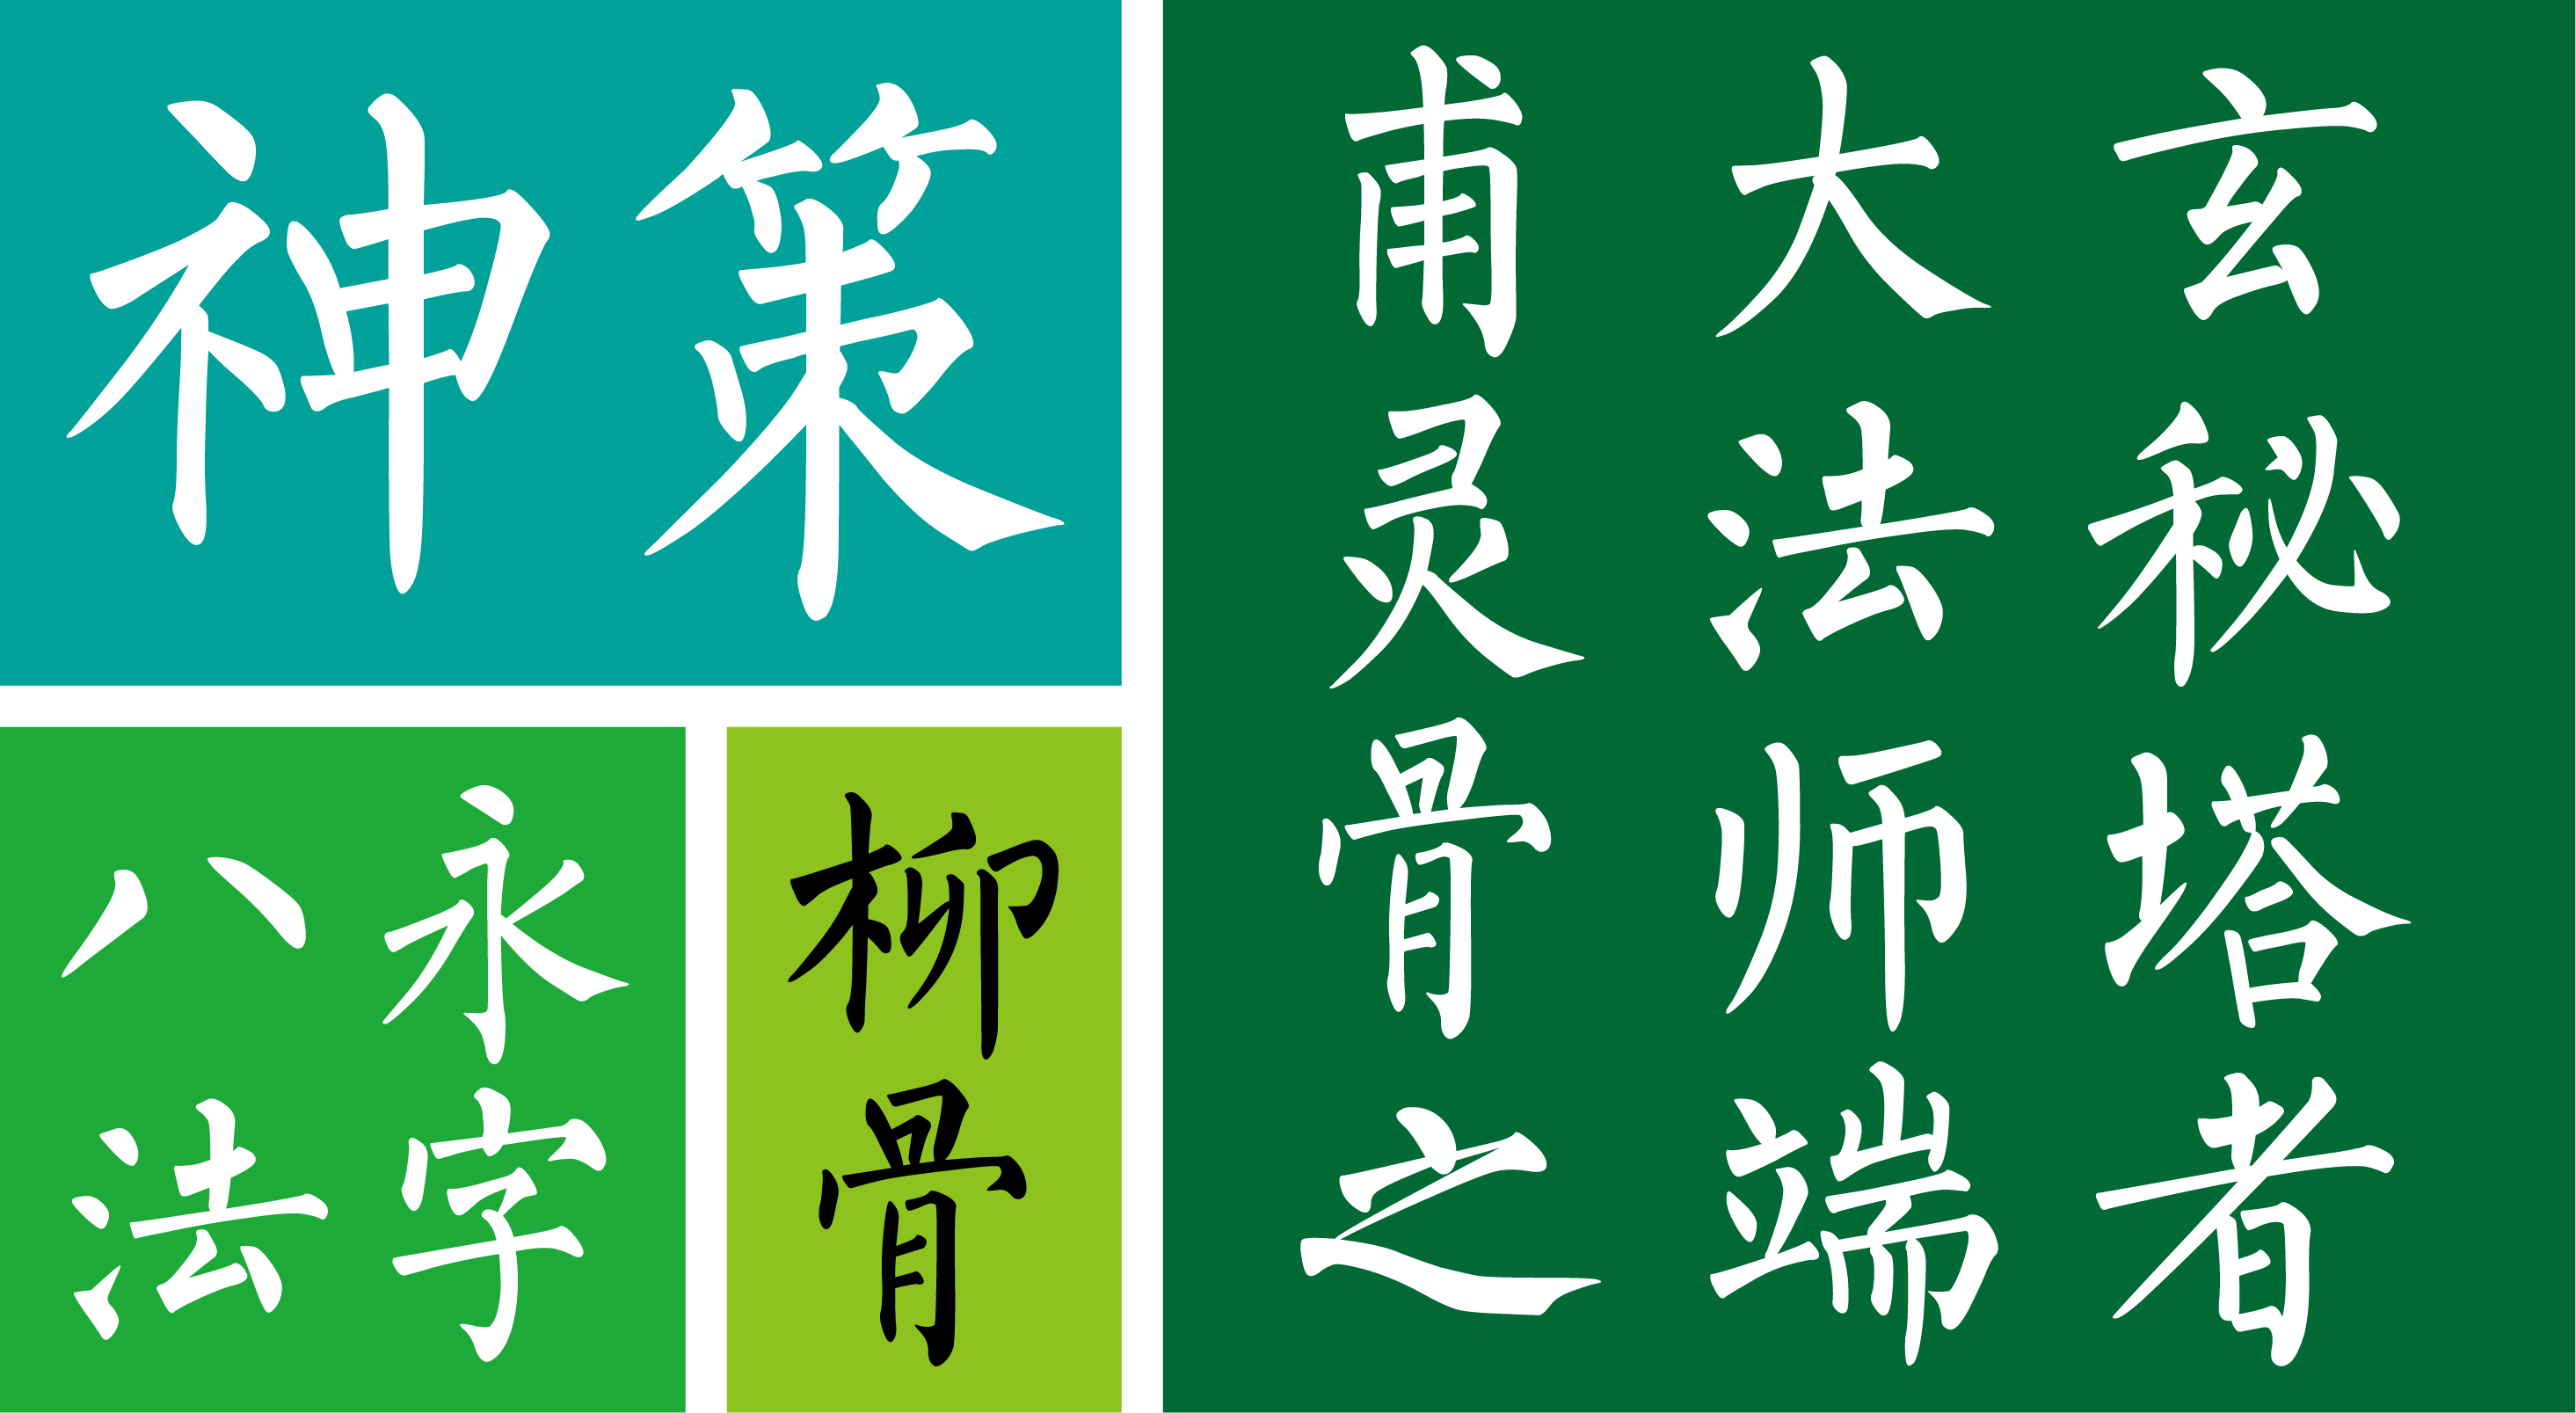 https://ft-bk1.oss-cn-zhangjiakou.aliyuncs.com/Public/Uploads/img/n_content_20201210174809_1235.png